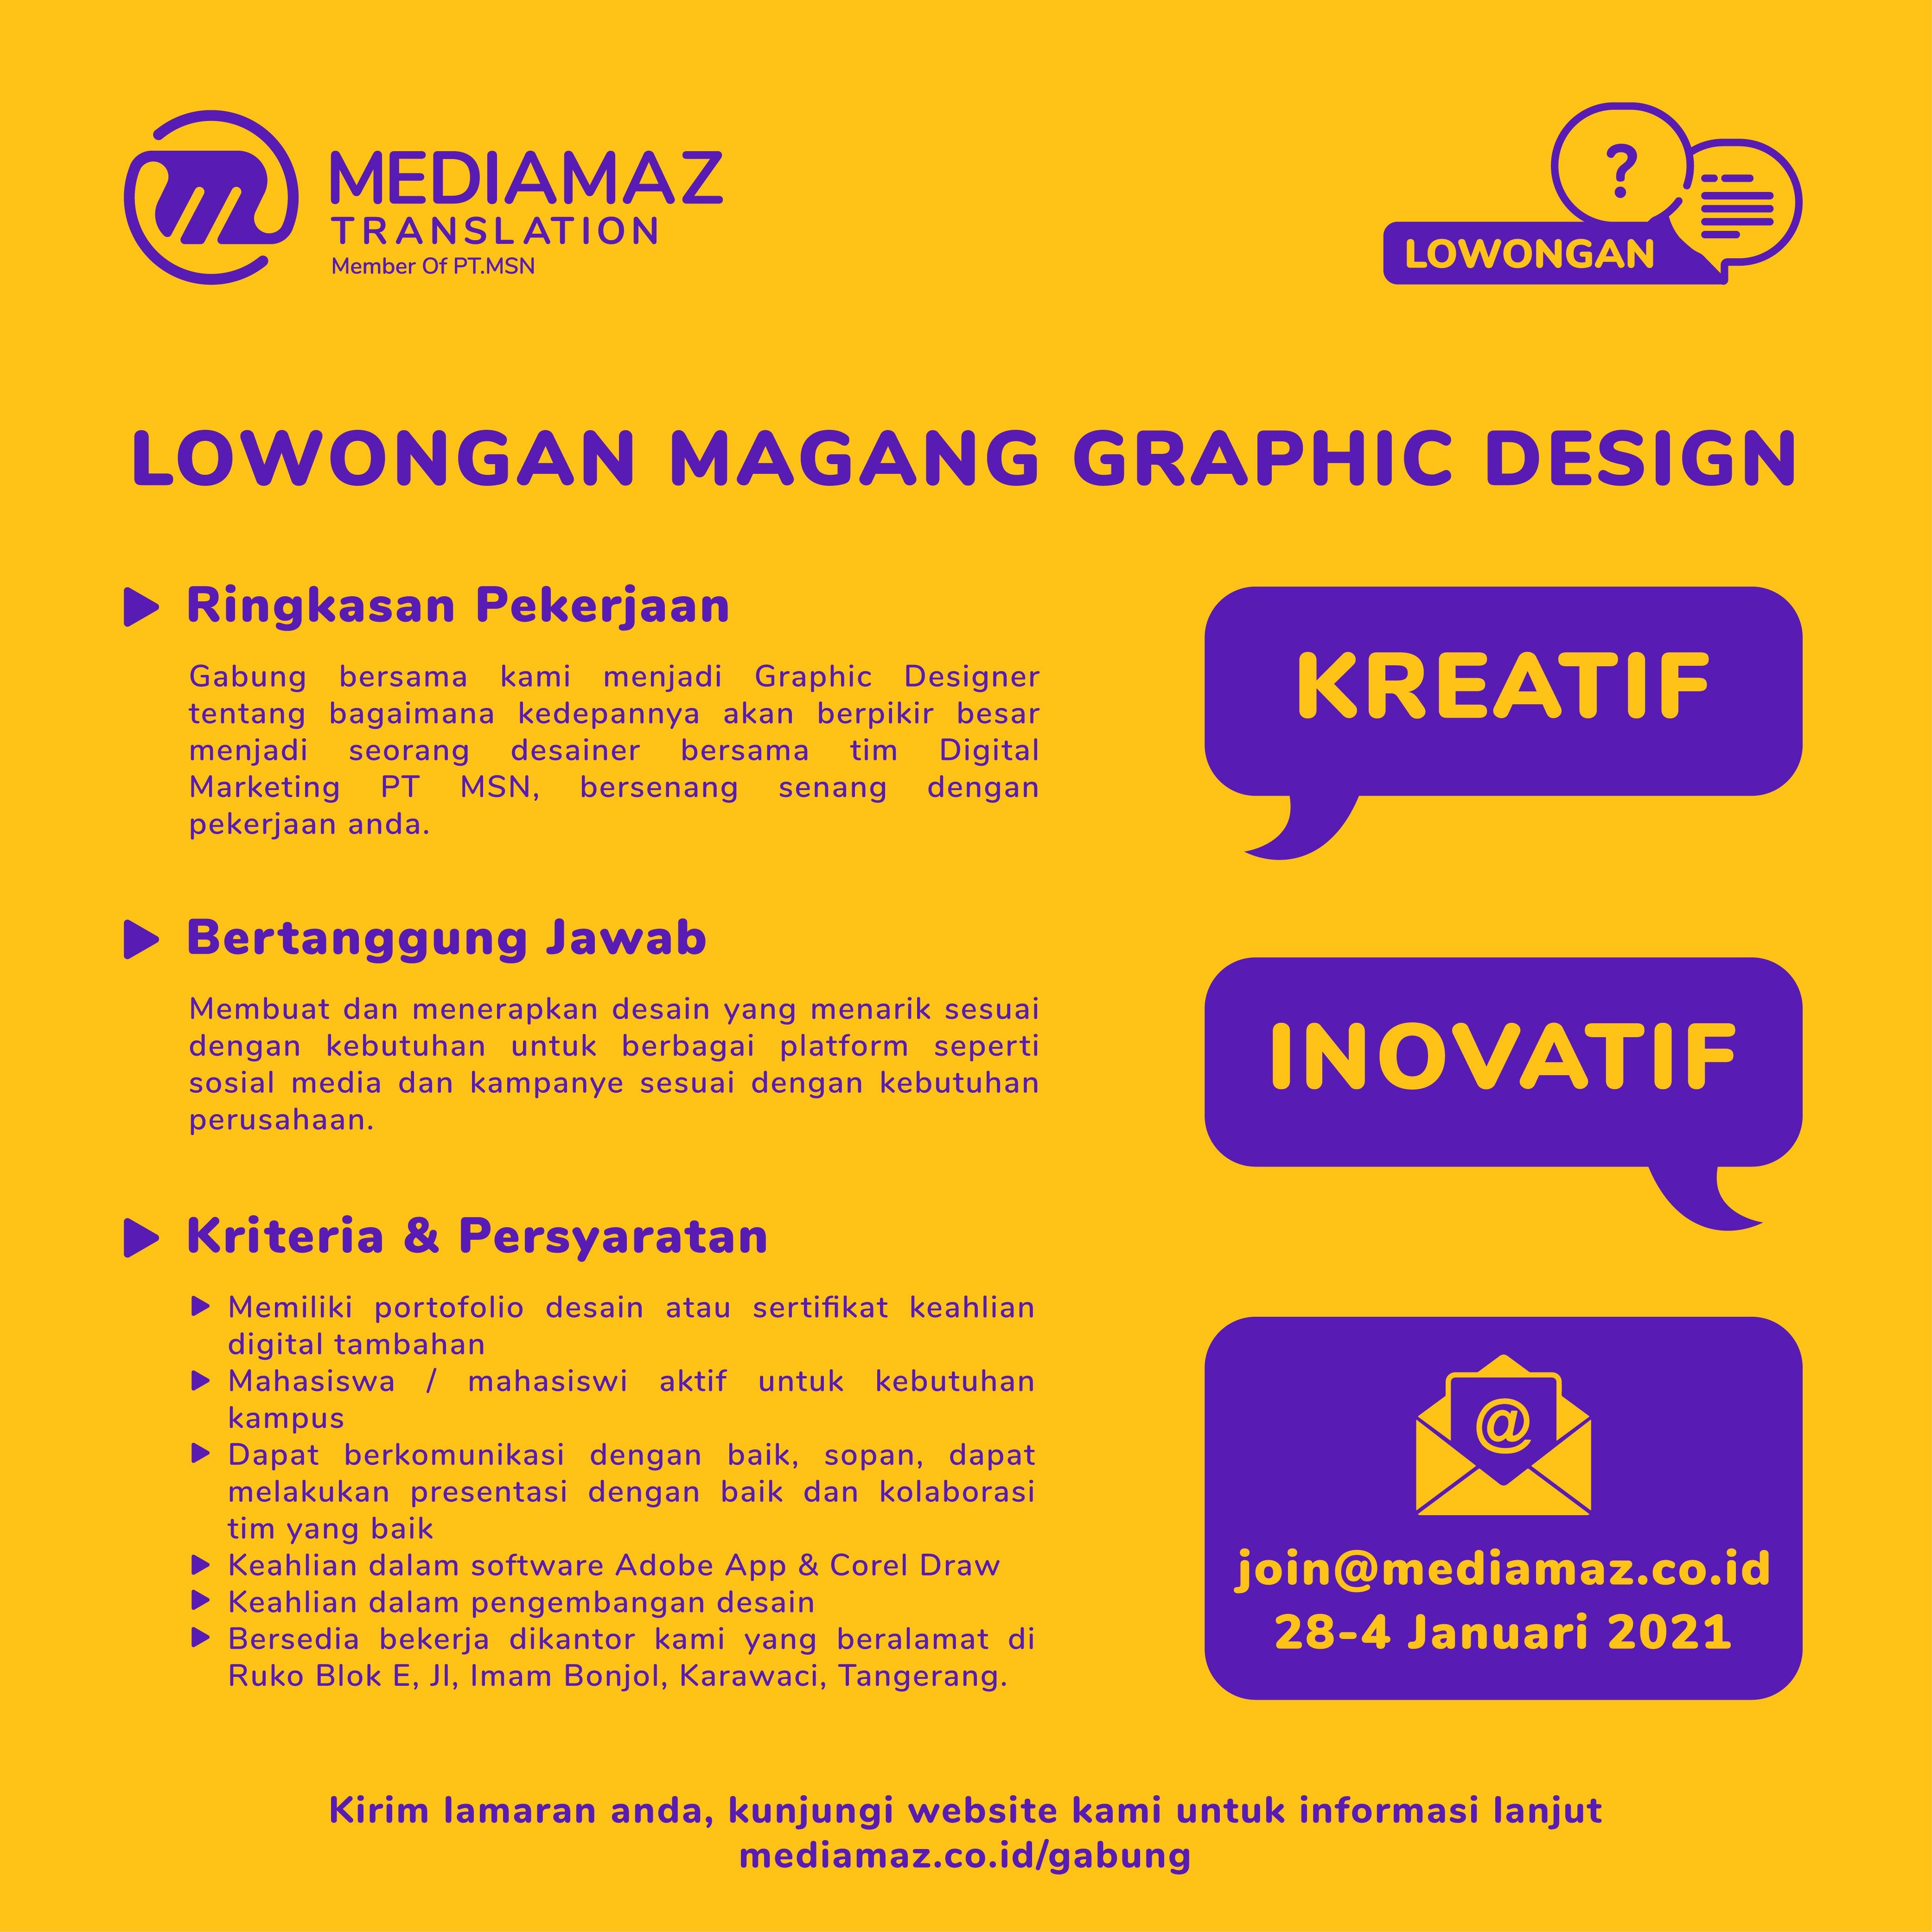 lowongan magang graphic design 2021